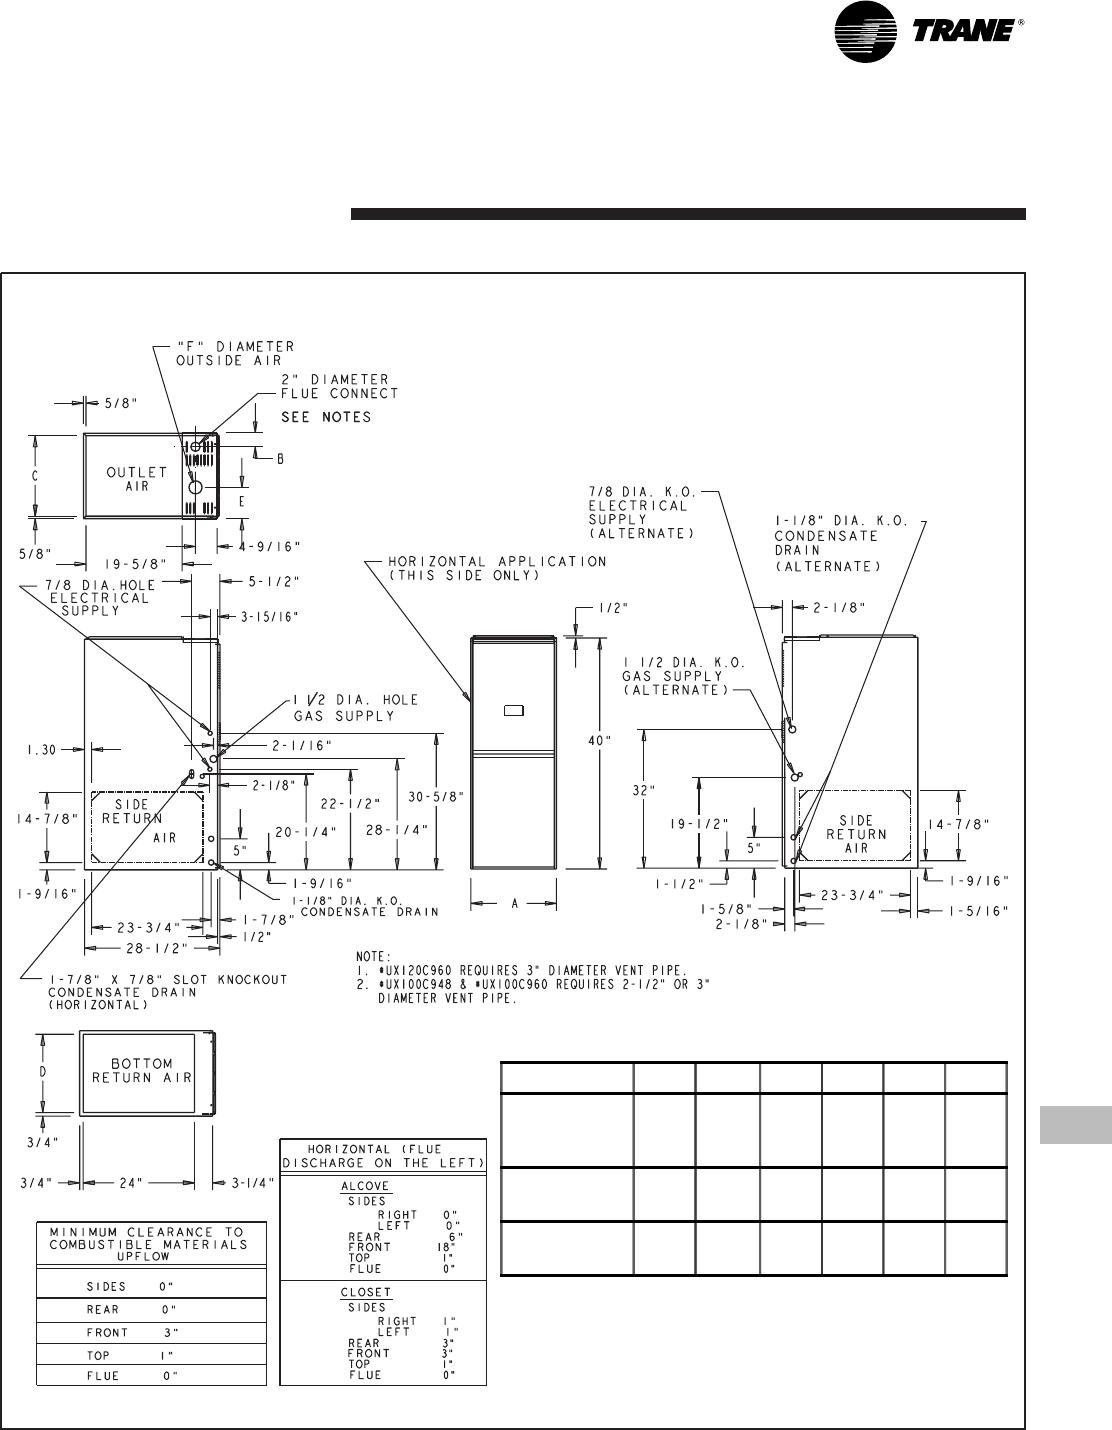 trane series e centravac 2002 chevrolet tahoe stereo wiring diagram xr 90 owners manual manualslib makes it easy